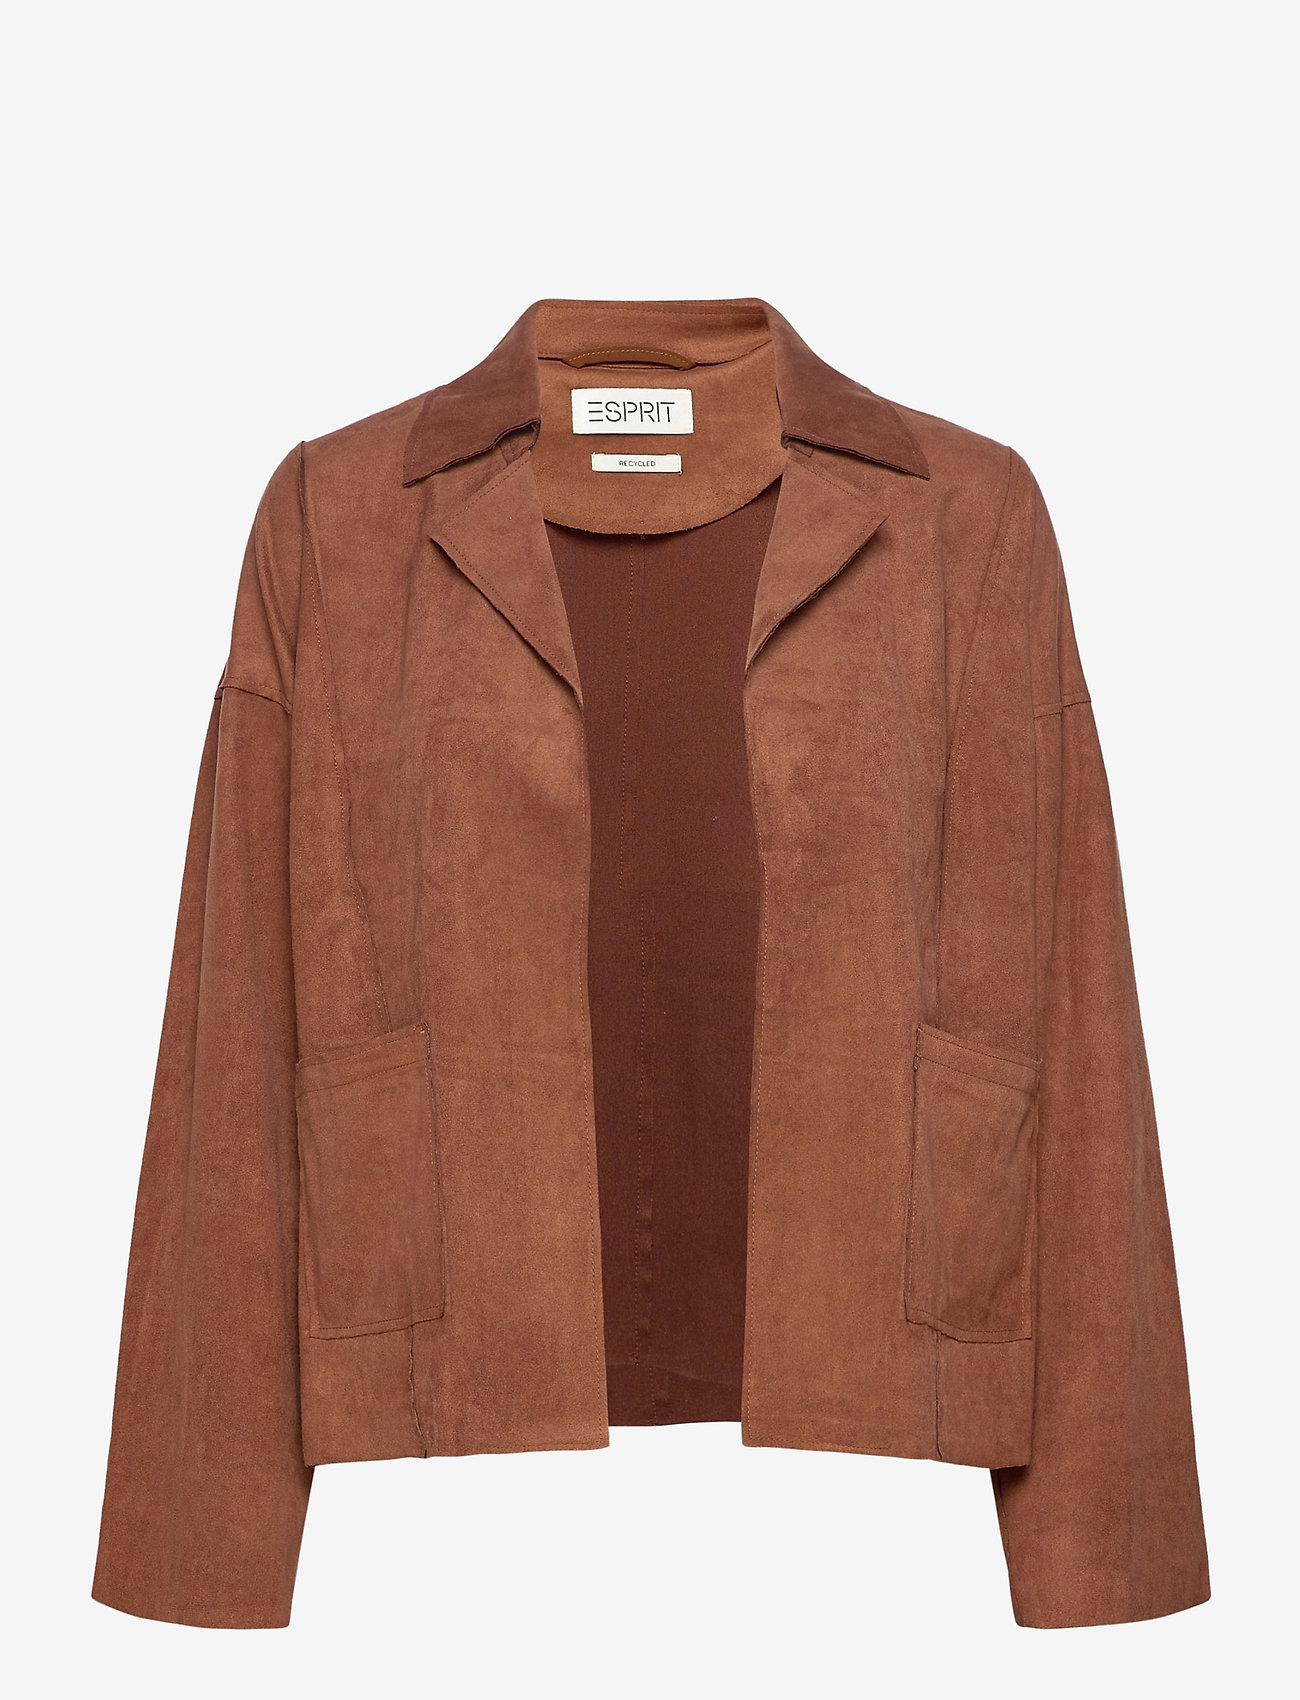 Esprit Casual - Jackets indoor woven - vestes legères - brown - 0